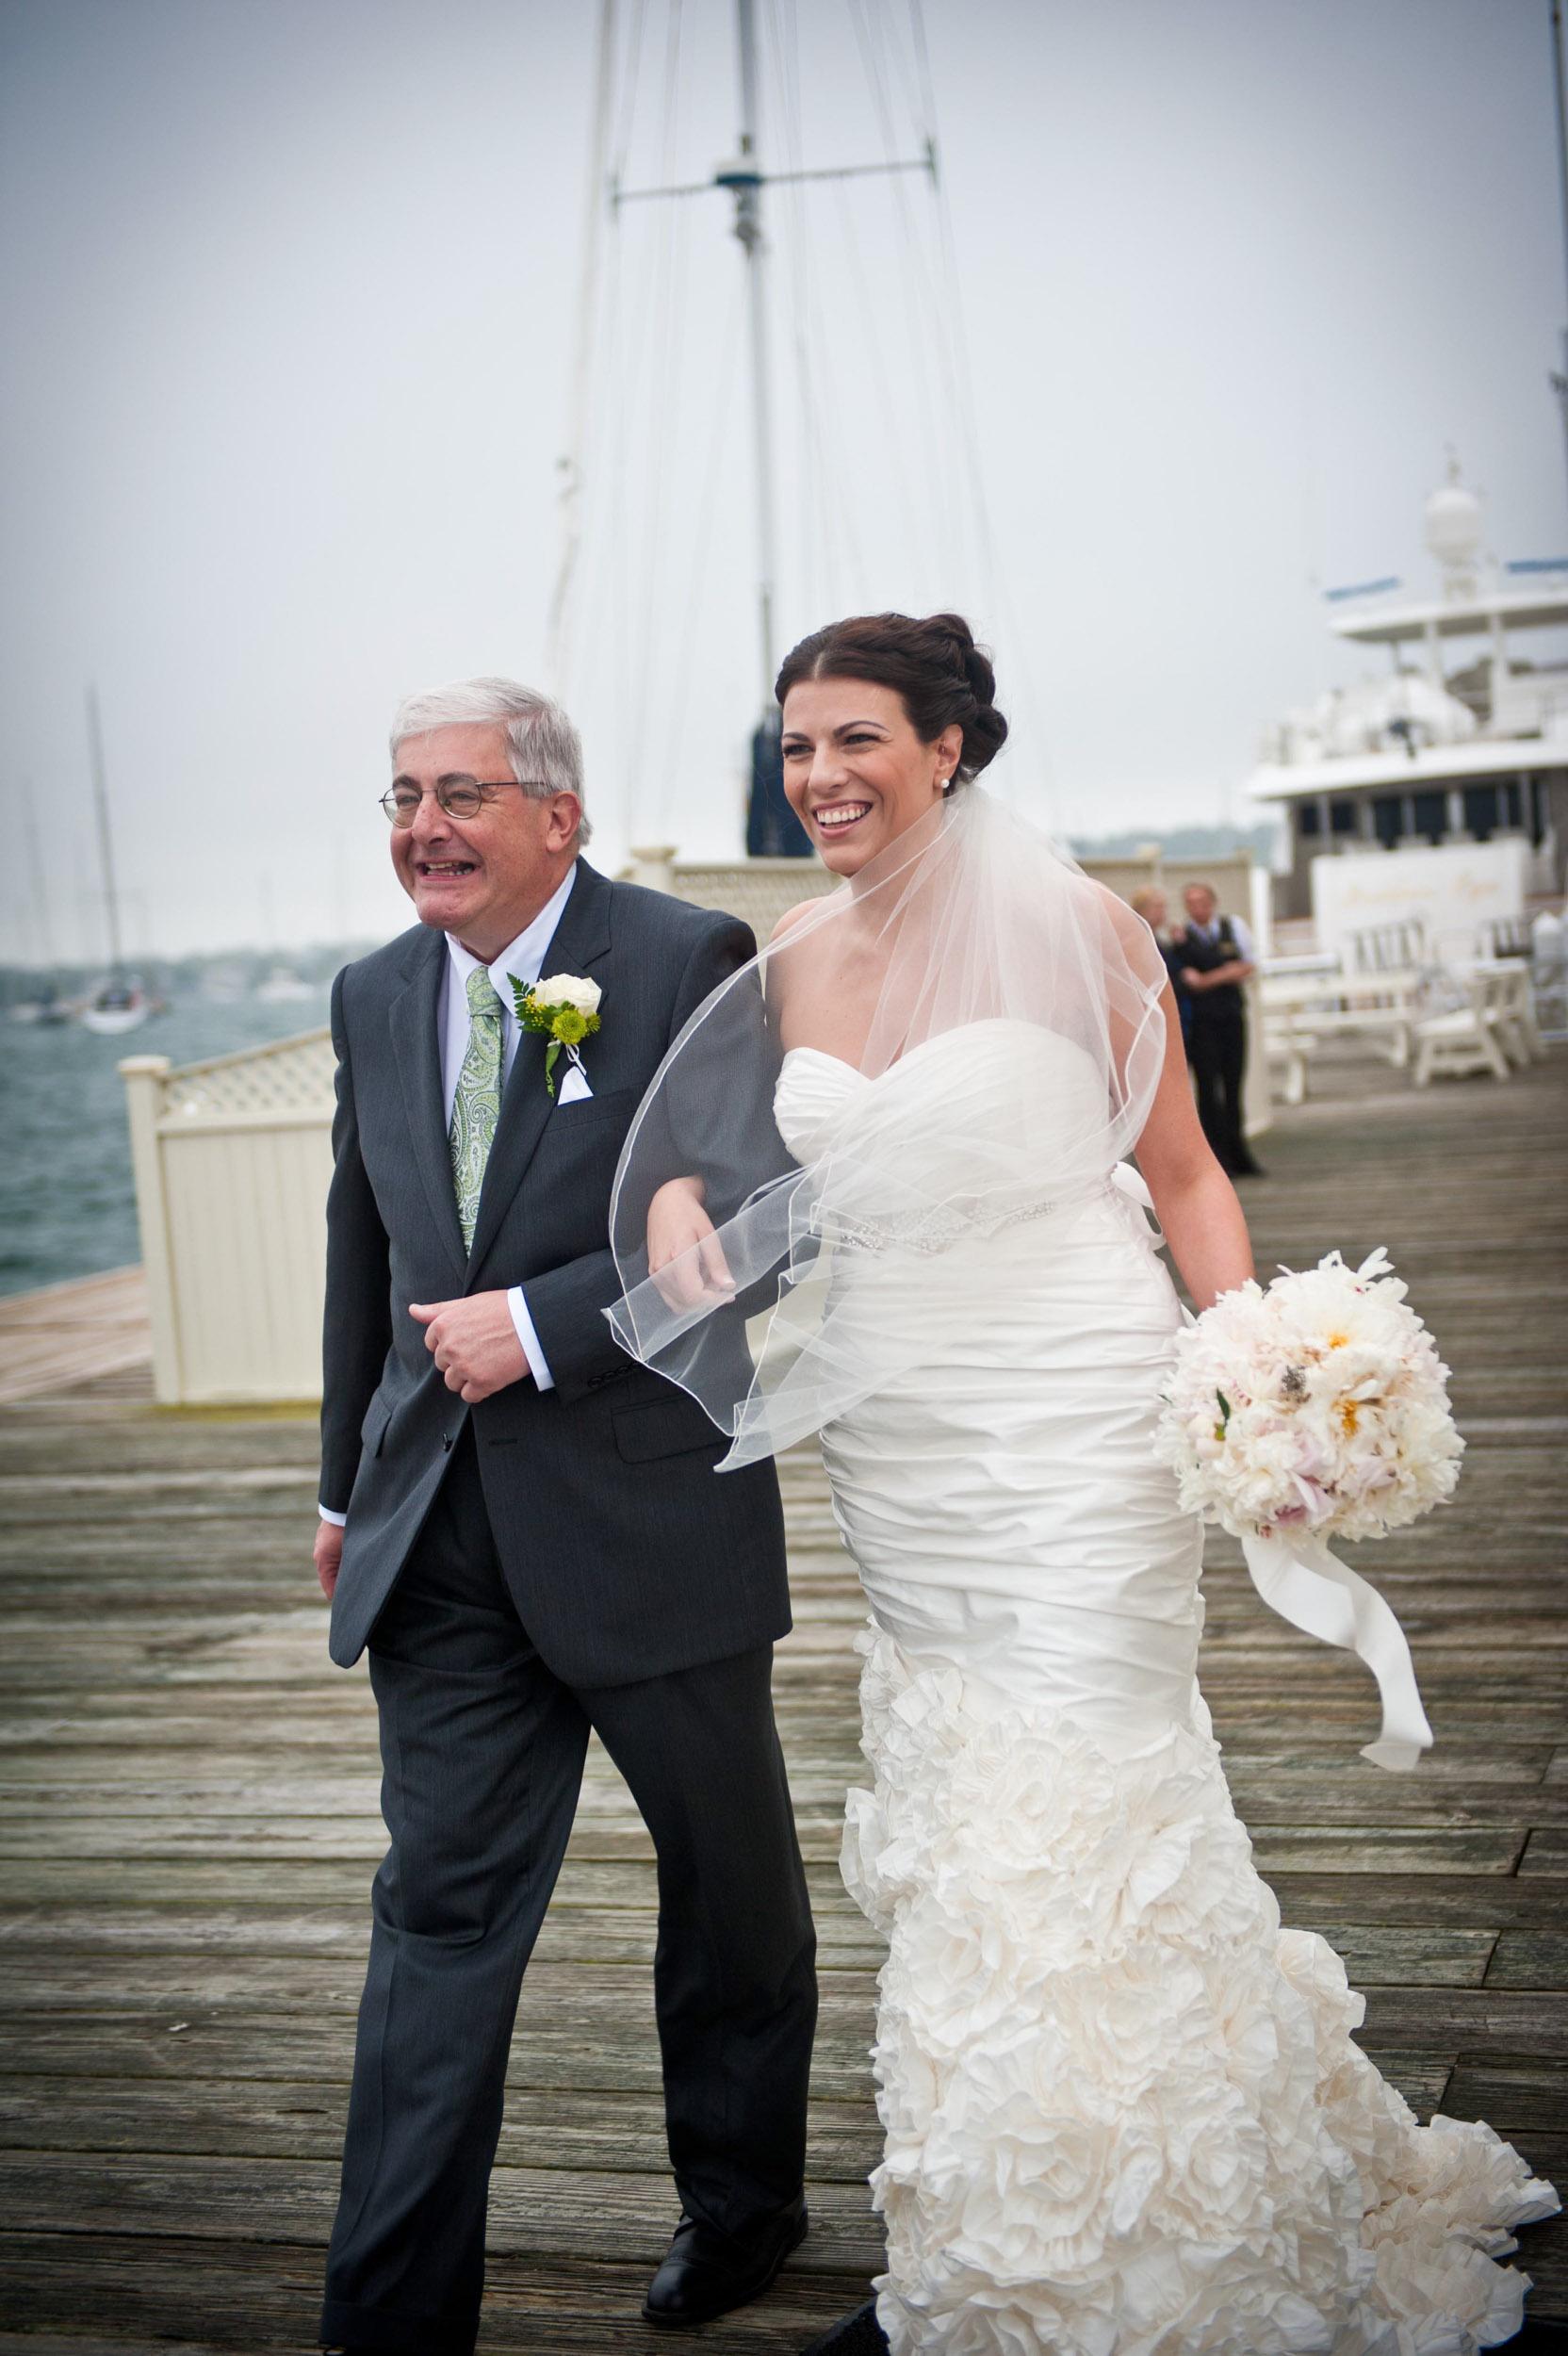 Wedding72_DSC8555-2.jpg